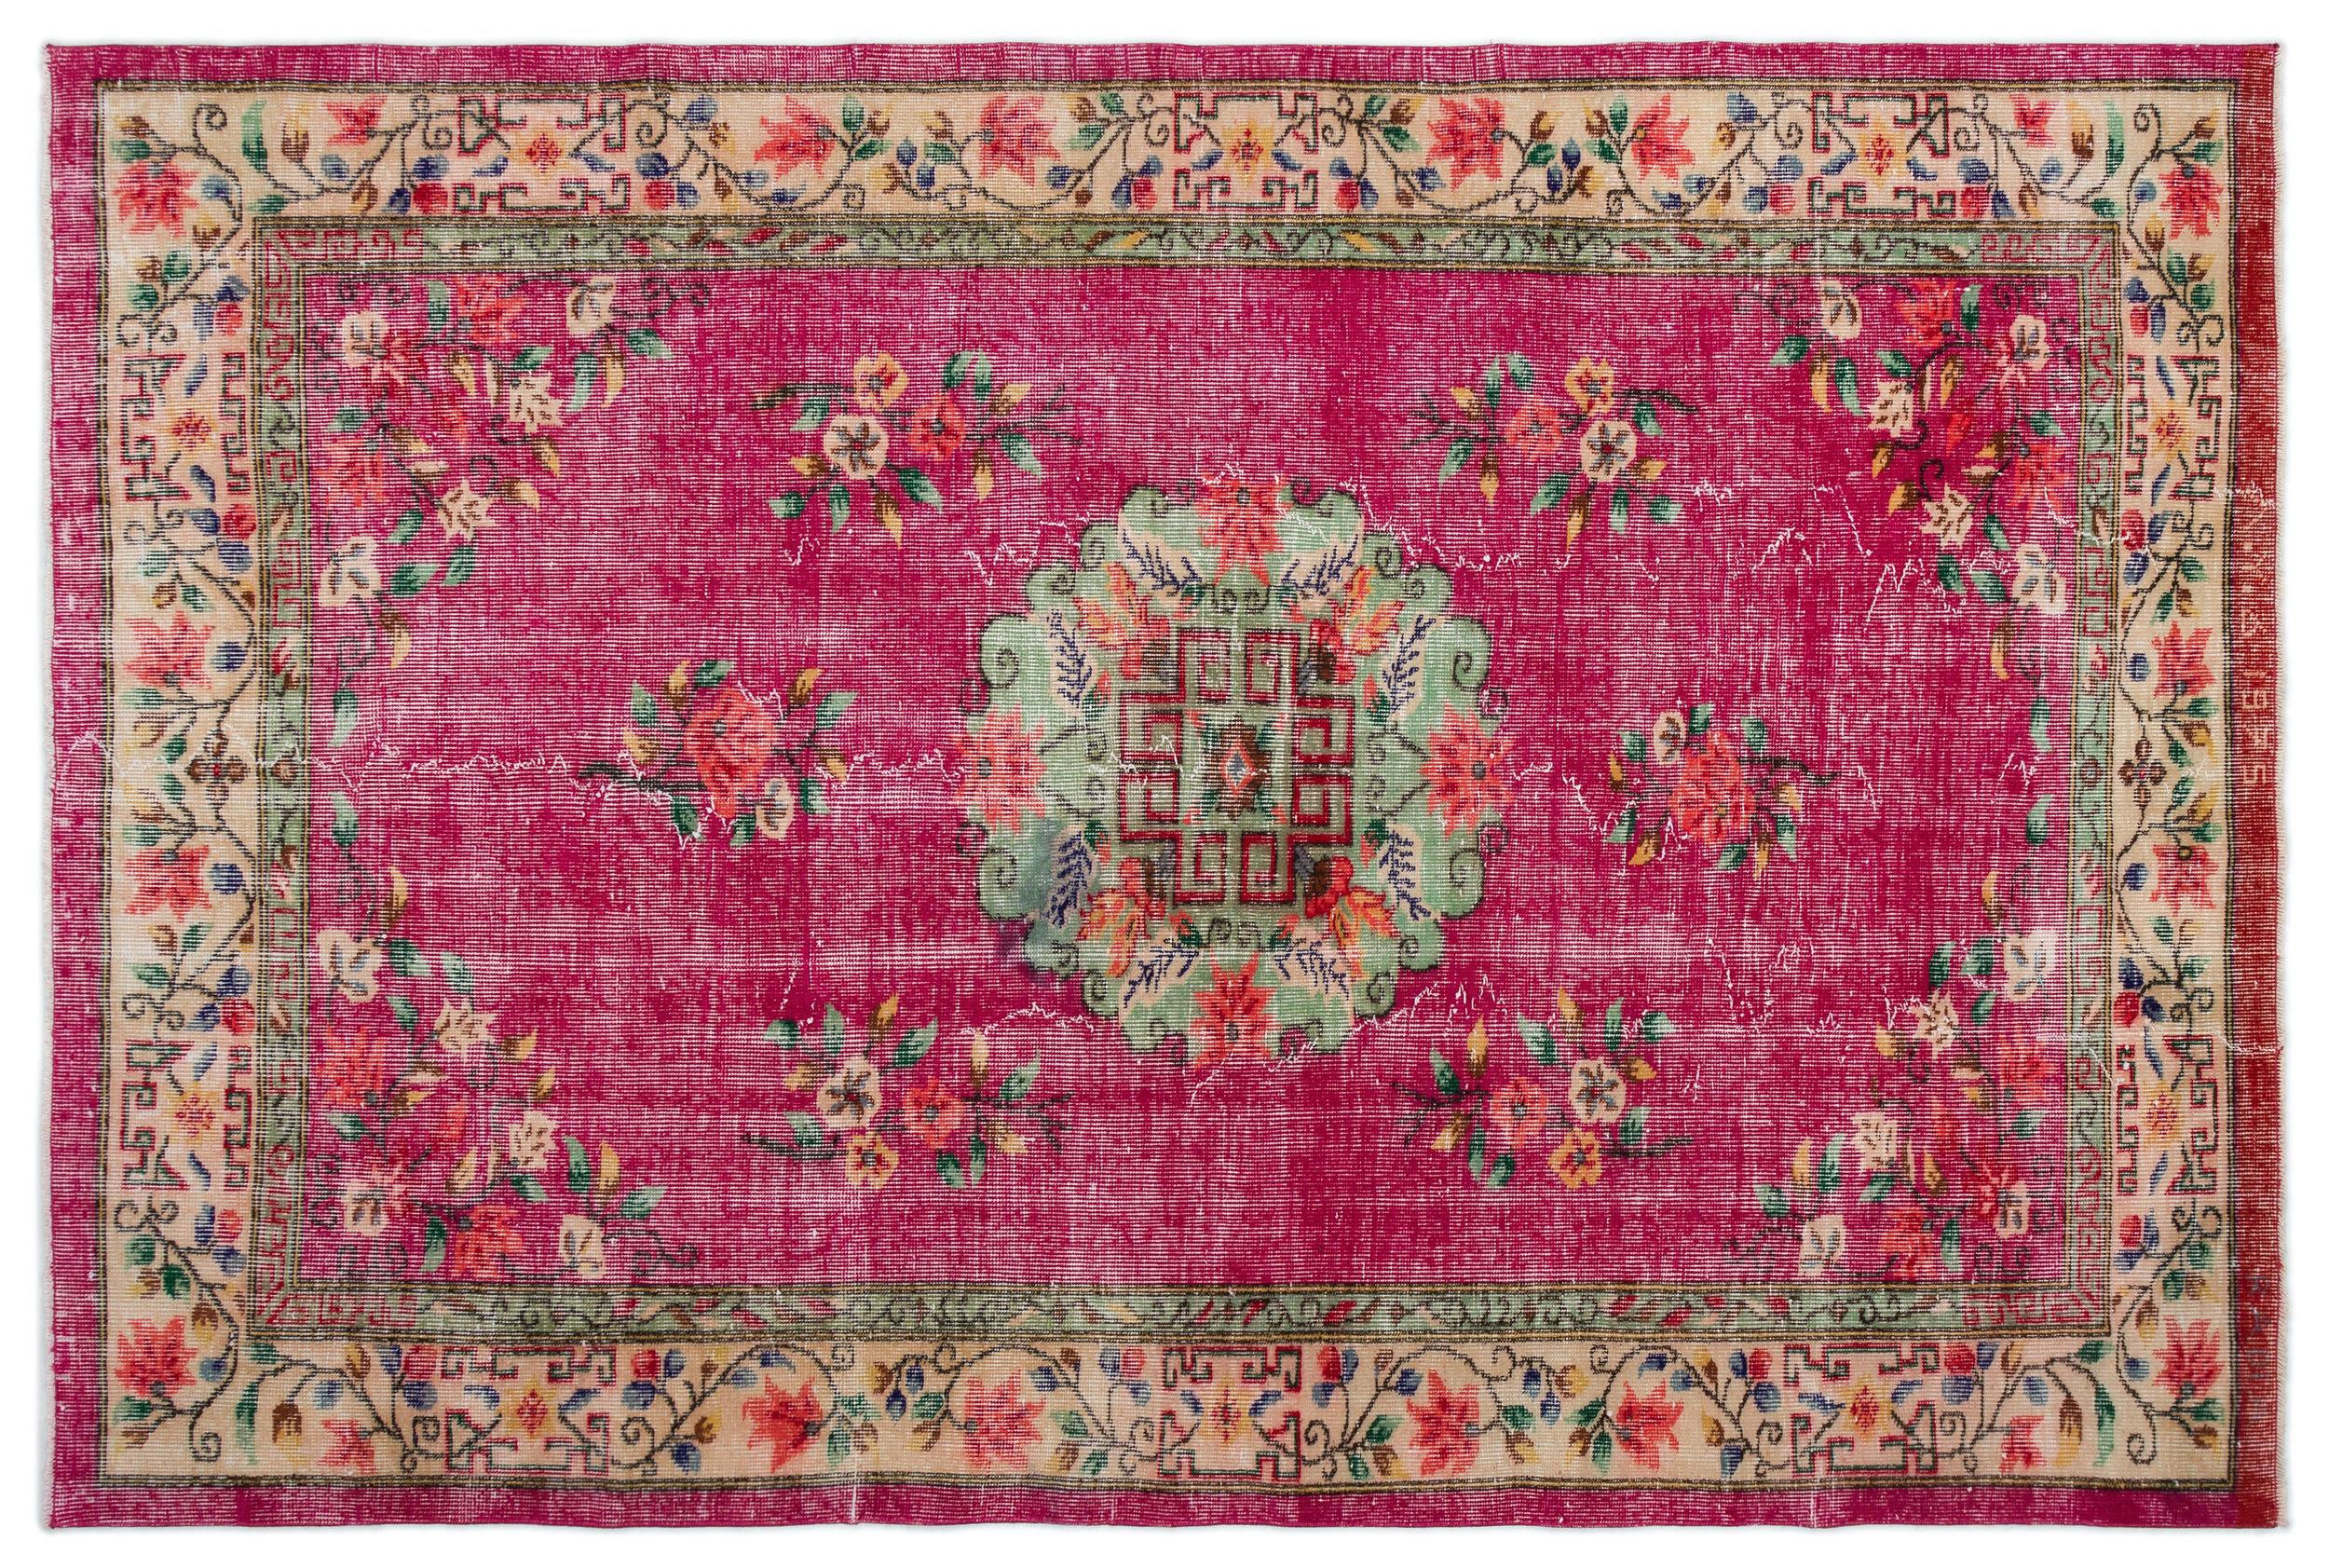 Tapijt Oud Roze : ≥ perzisch tapijt vloerkleed pers wol rood roze stoffering